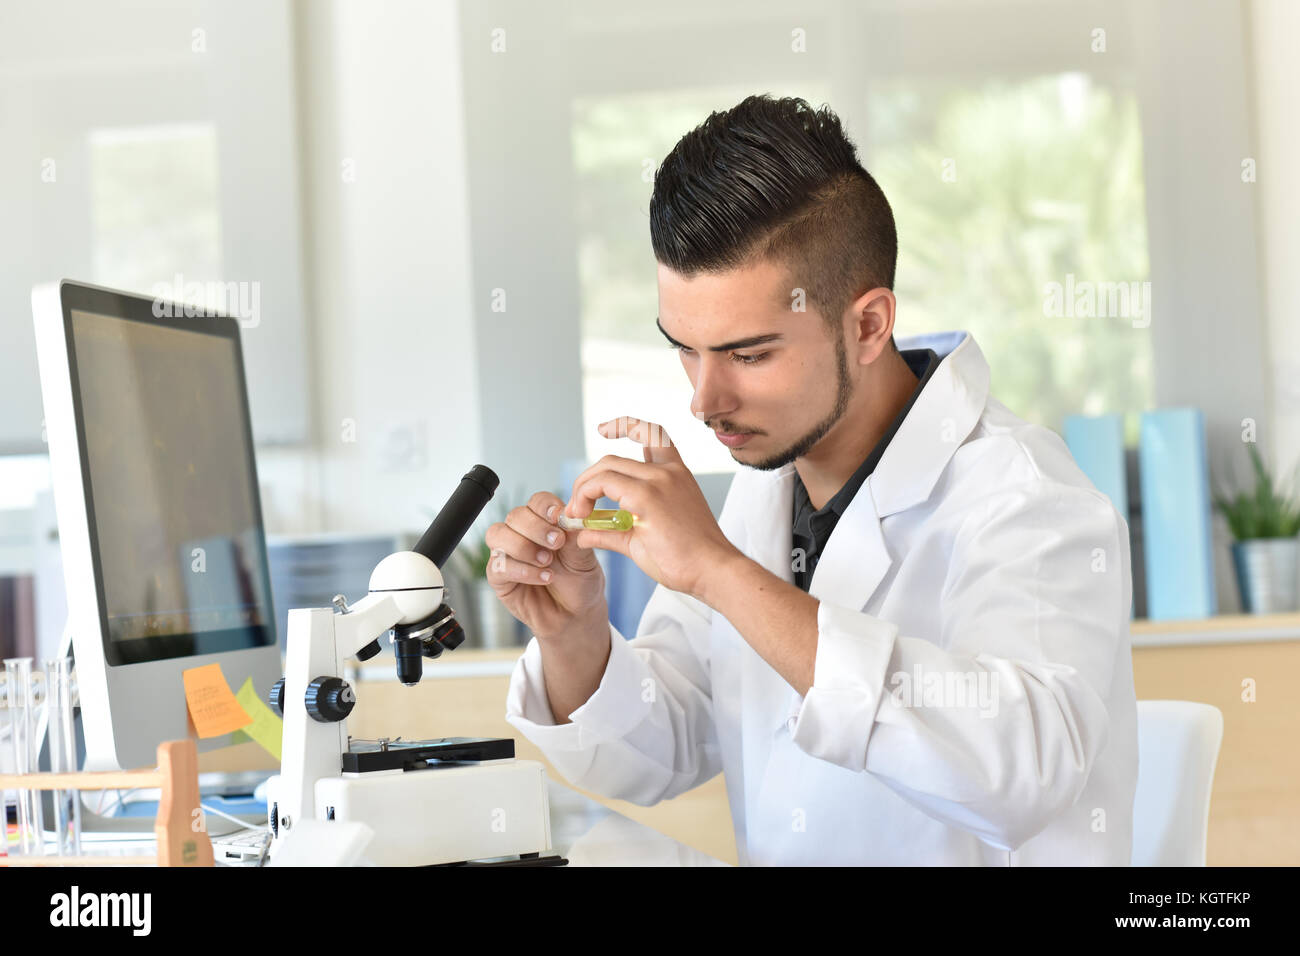 Biology class experiment stockfotos & biology class experiment